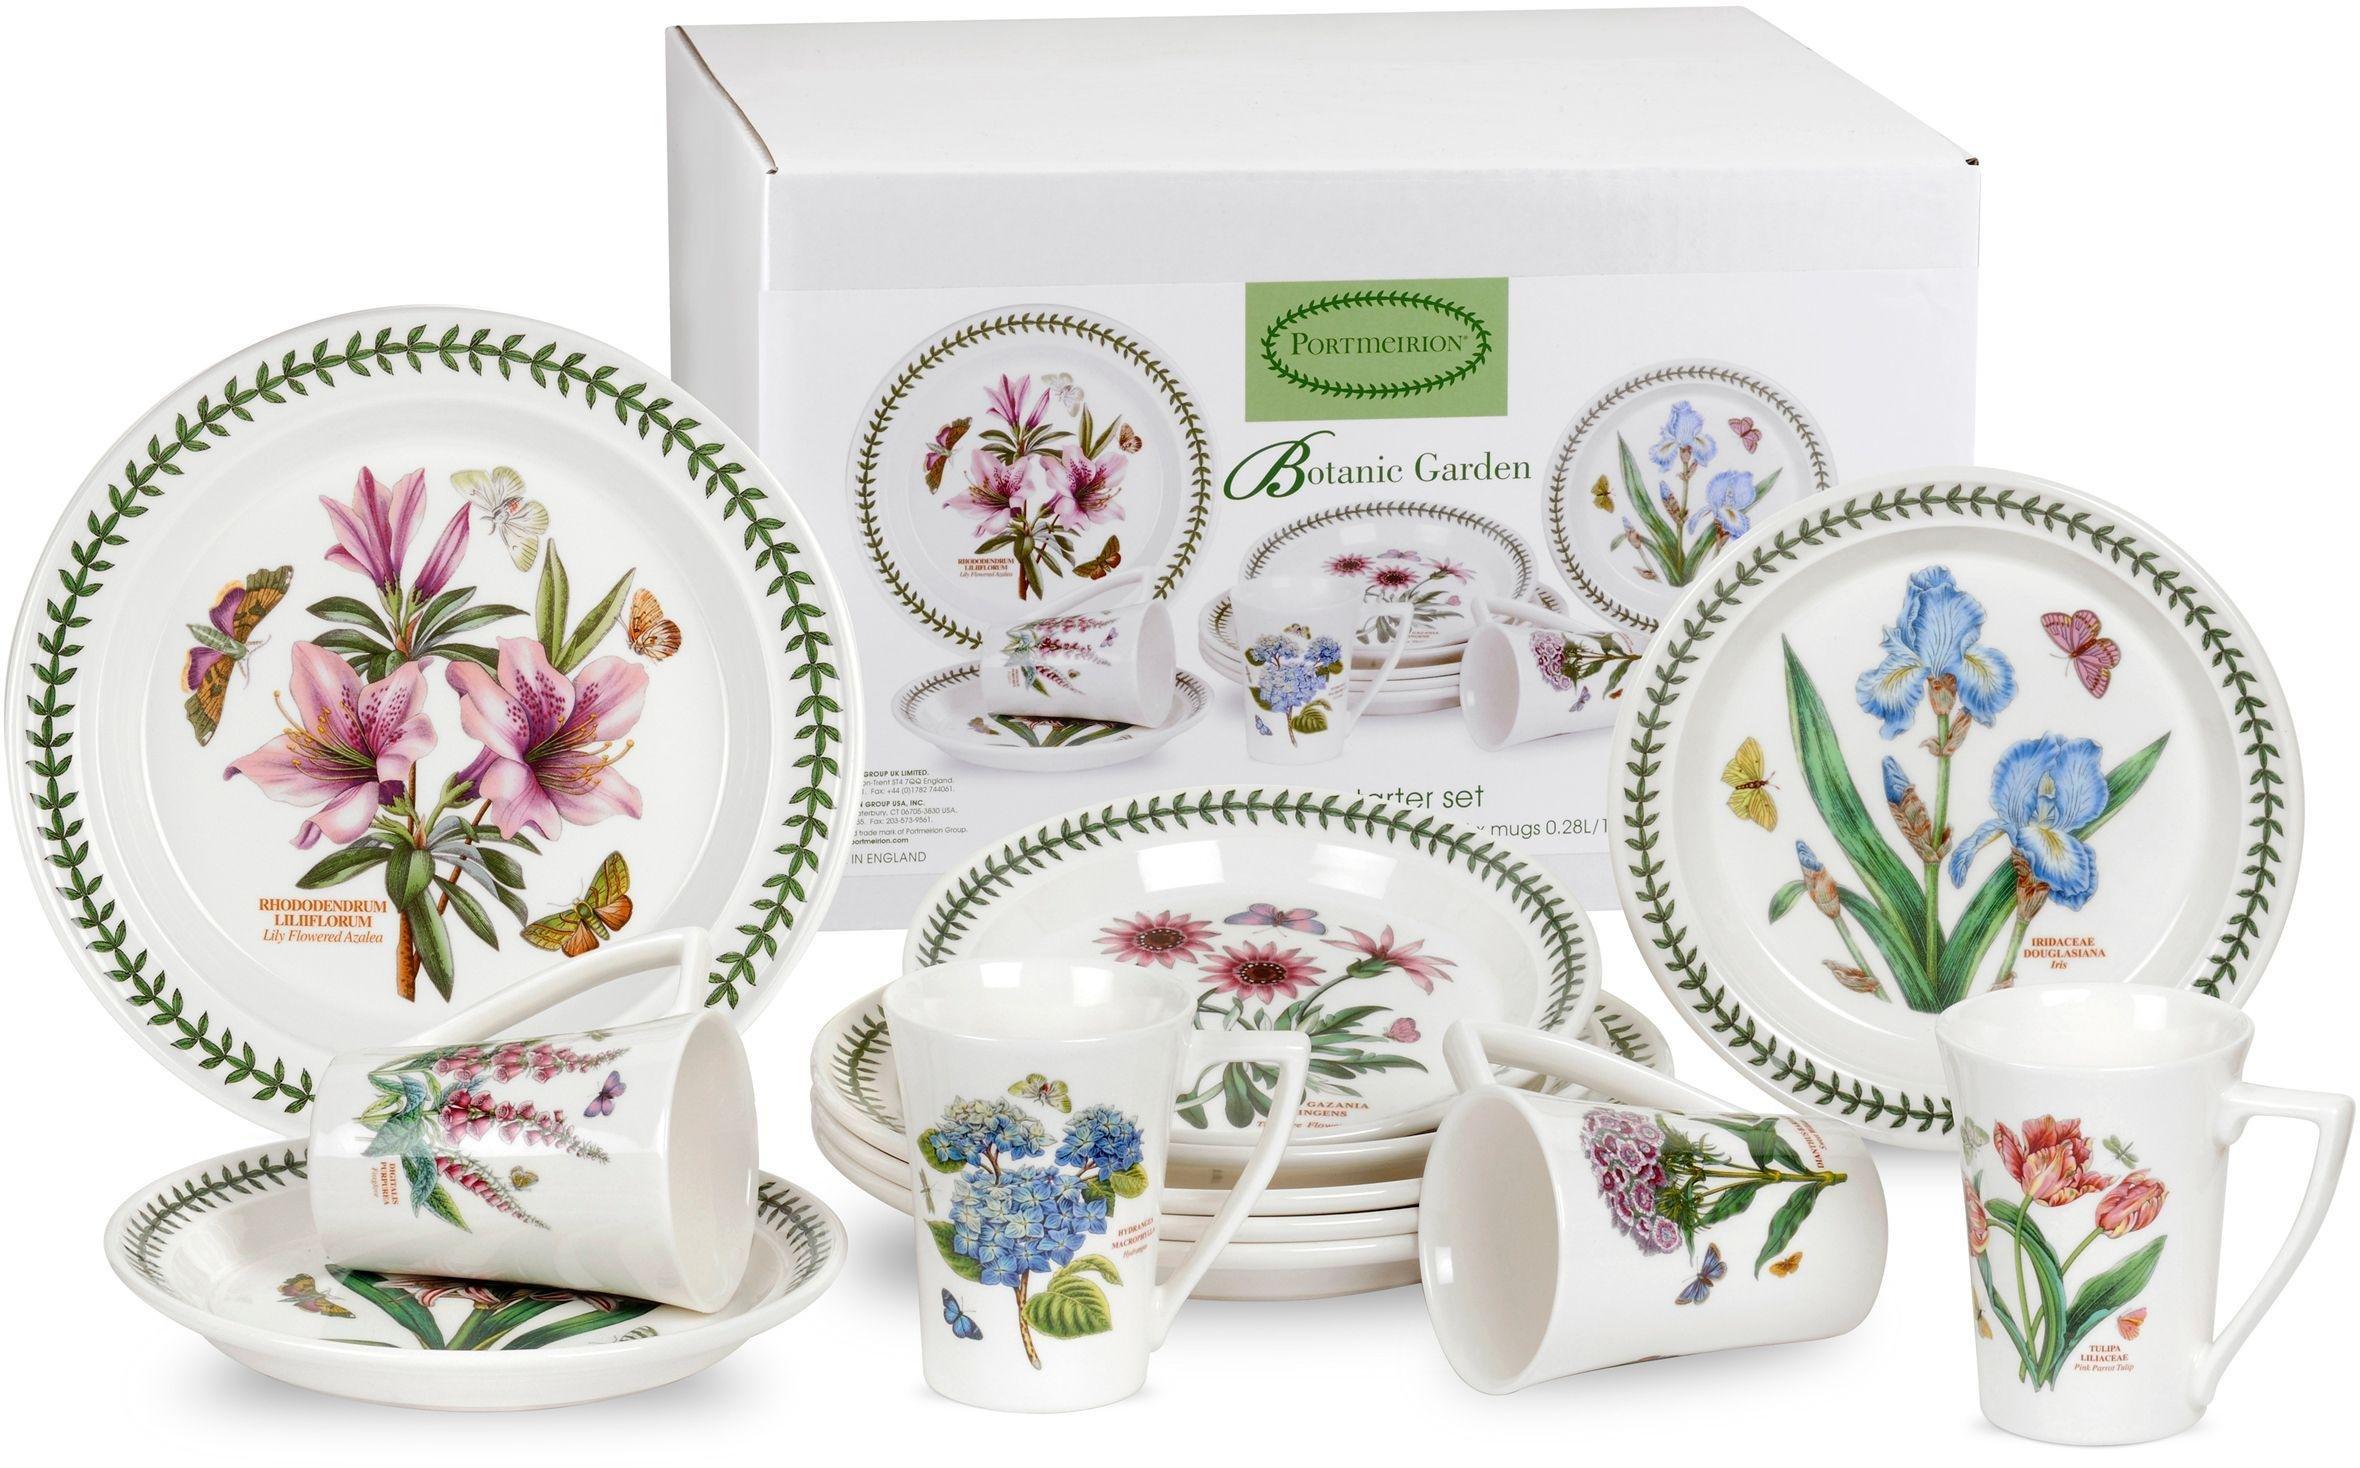 portmeirion botanic garden 12 piece ceramic dinner set